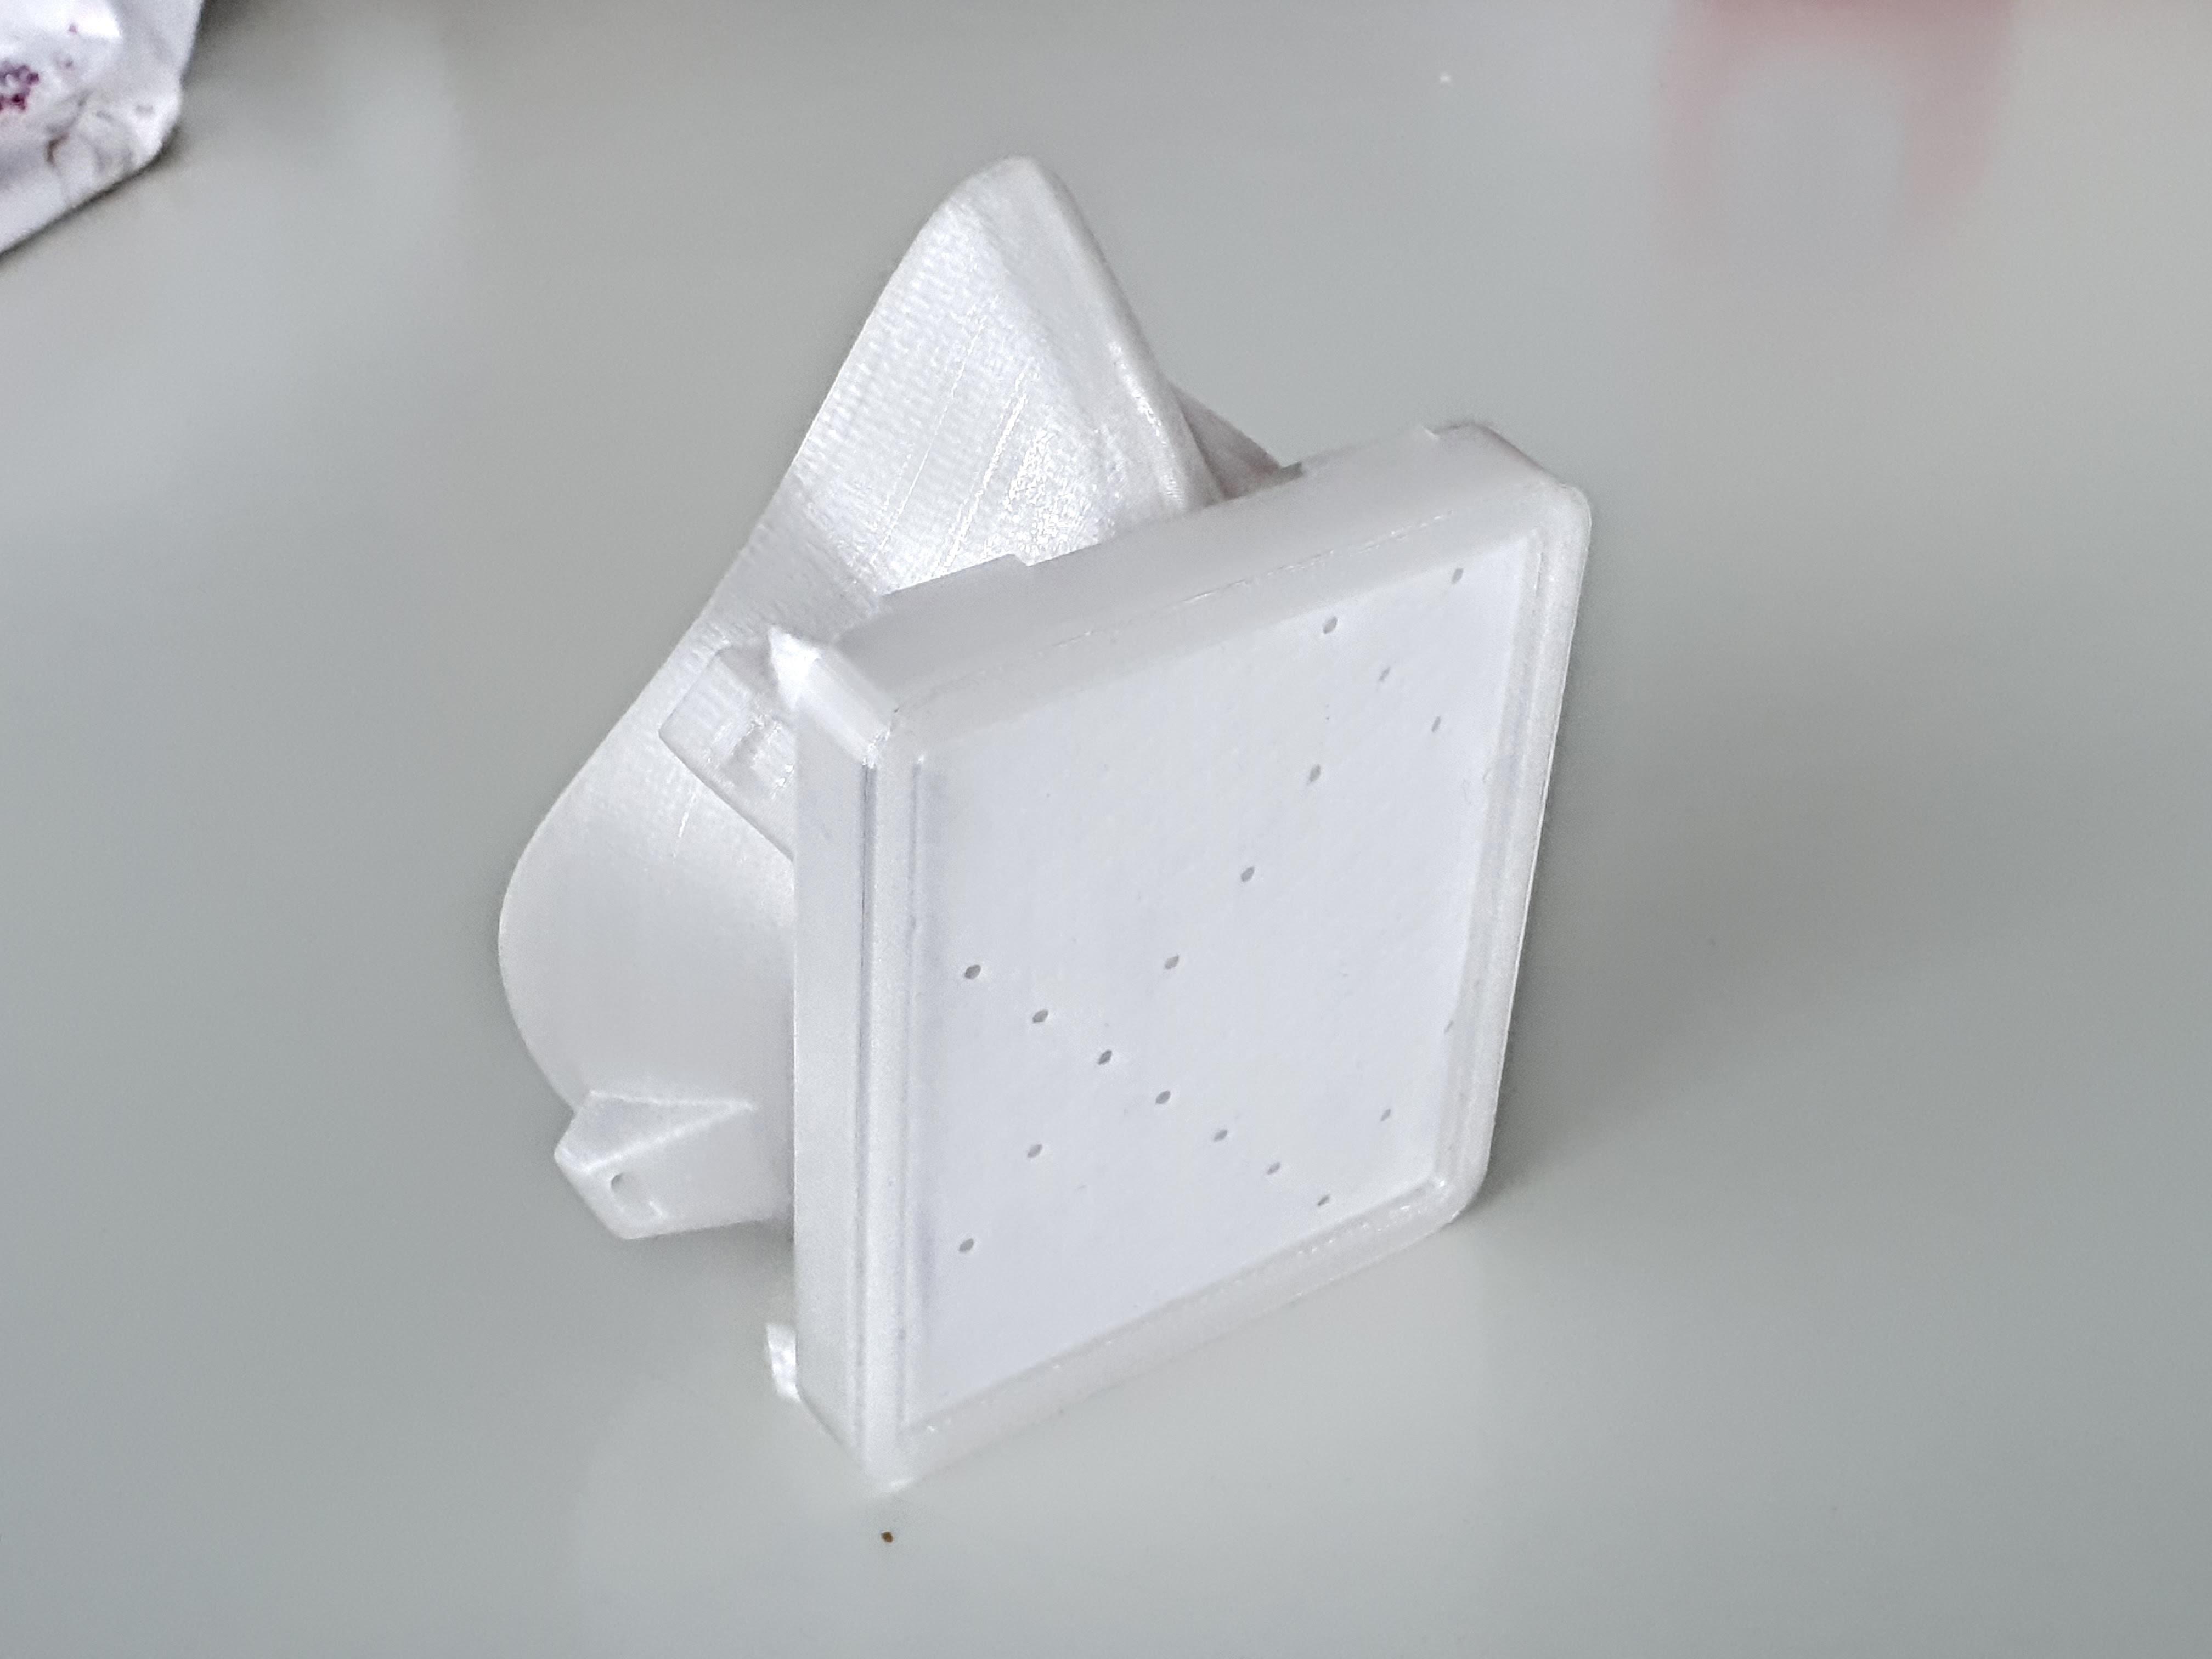 20200321_122104.jpg Download free STL file Covid corona mask - use with vacuum cleaner bag. Easy breathing.  • 3D printing template, mcermak